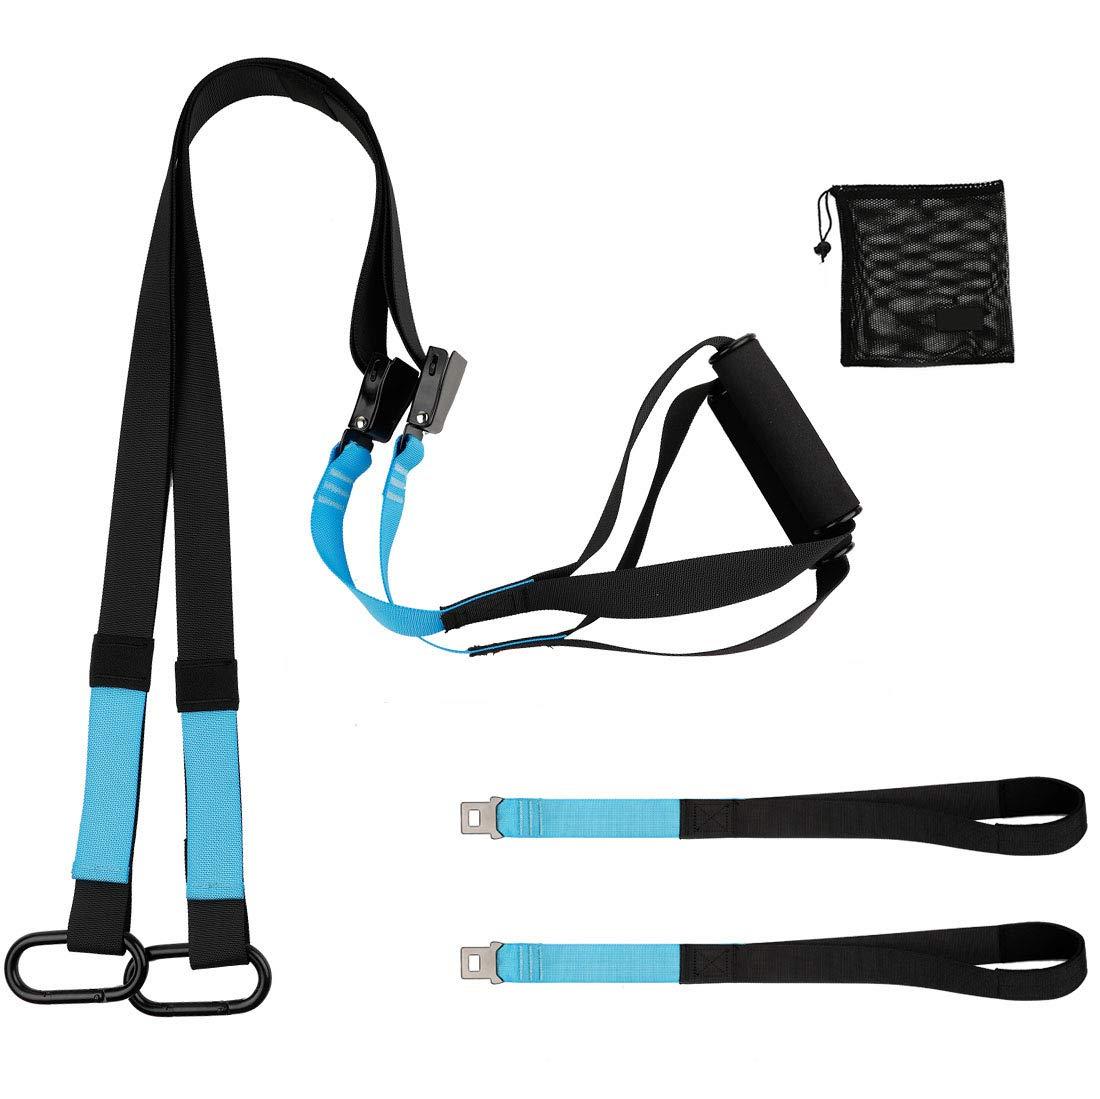 Schlingentrainer Sling Trainer Schlingentraining Set mit Türanker für Ganzkörpertraining zuhause oder im Fitnessstudio von KEAFOLS product image